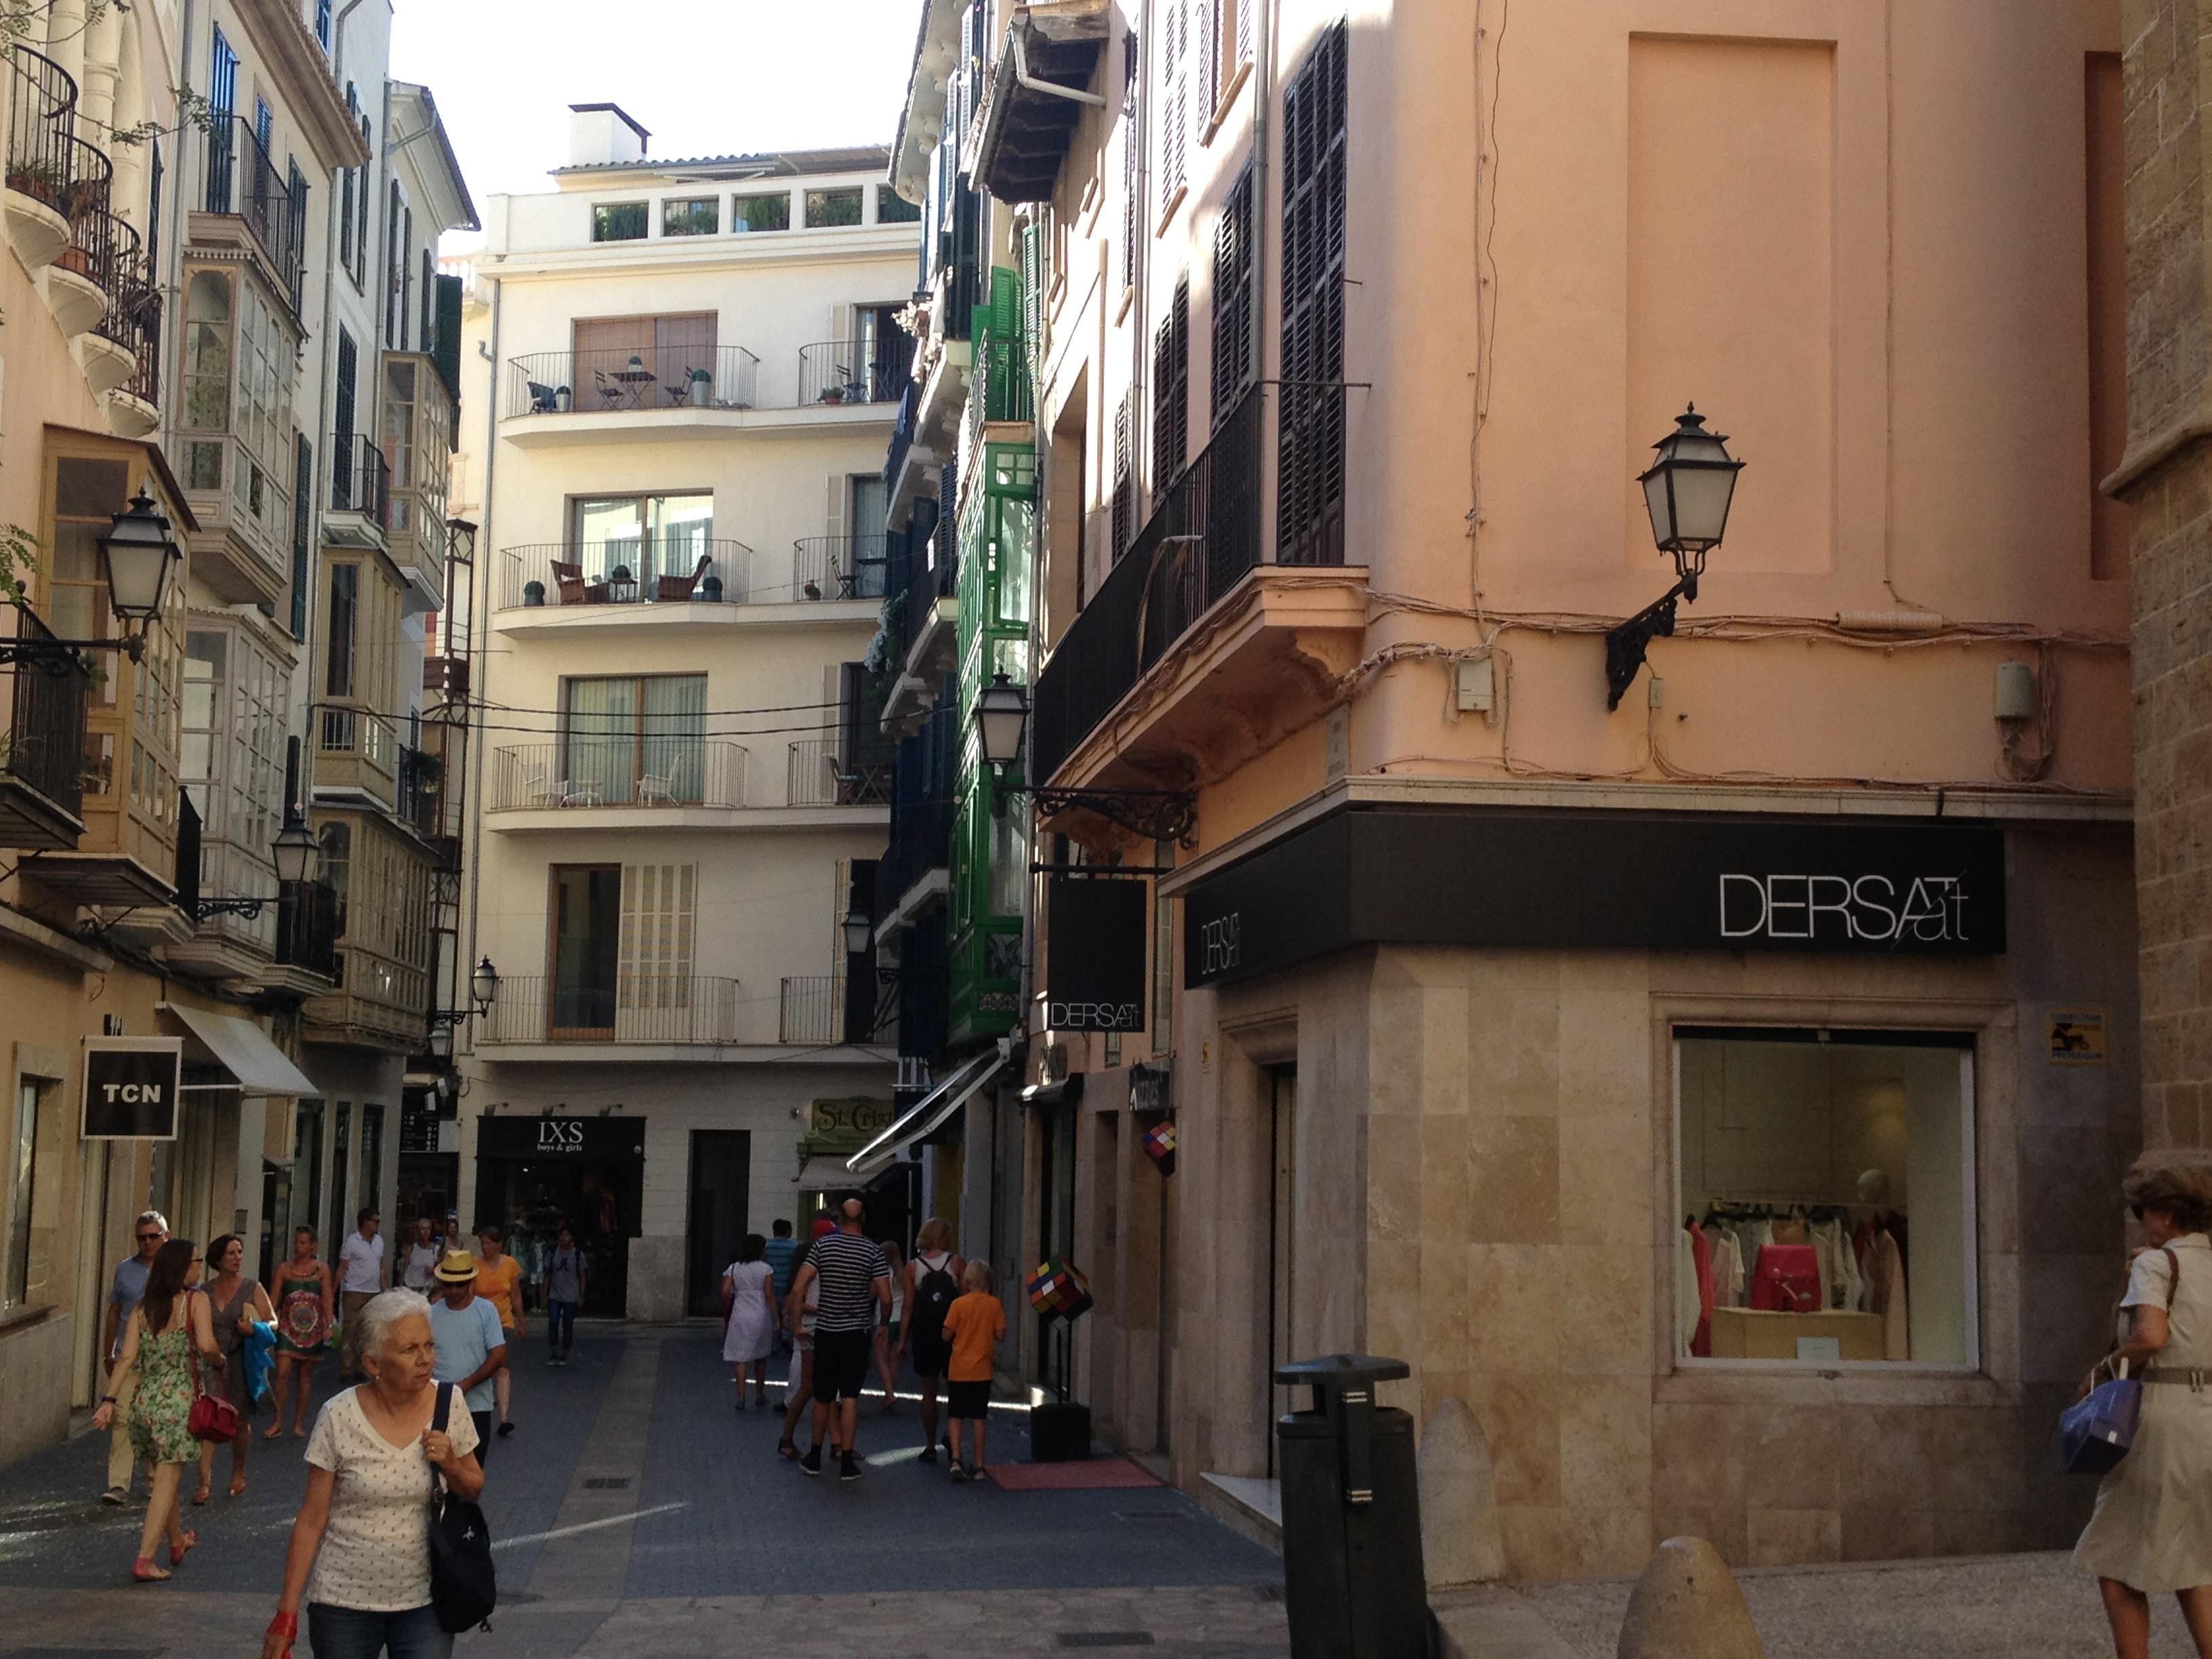 Old Palma De Mallorca 2585 Copyright Shelagh Donnelly